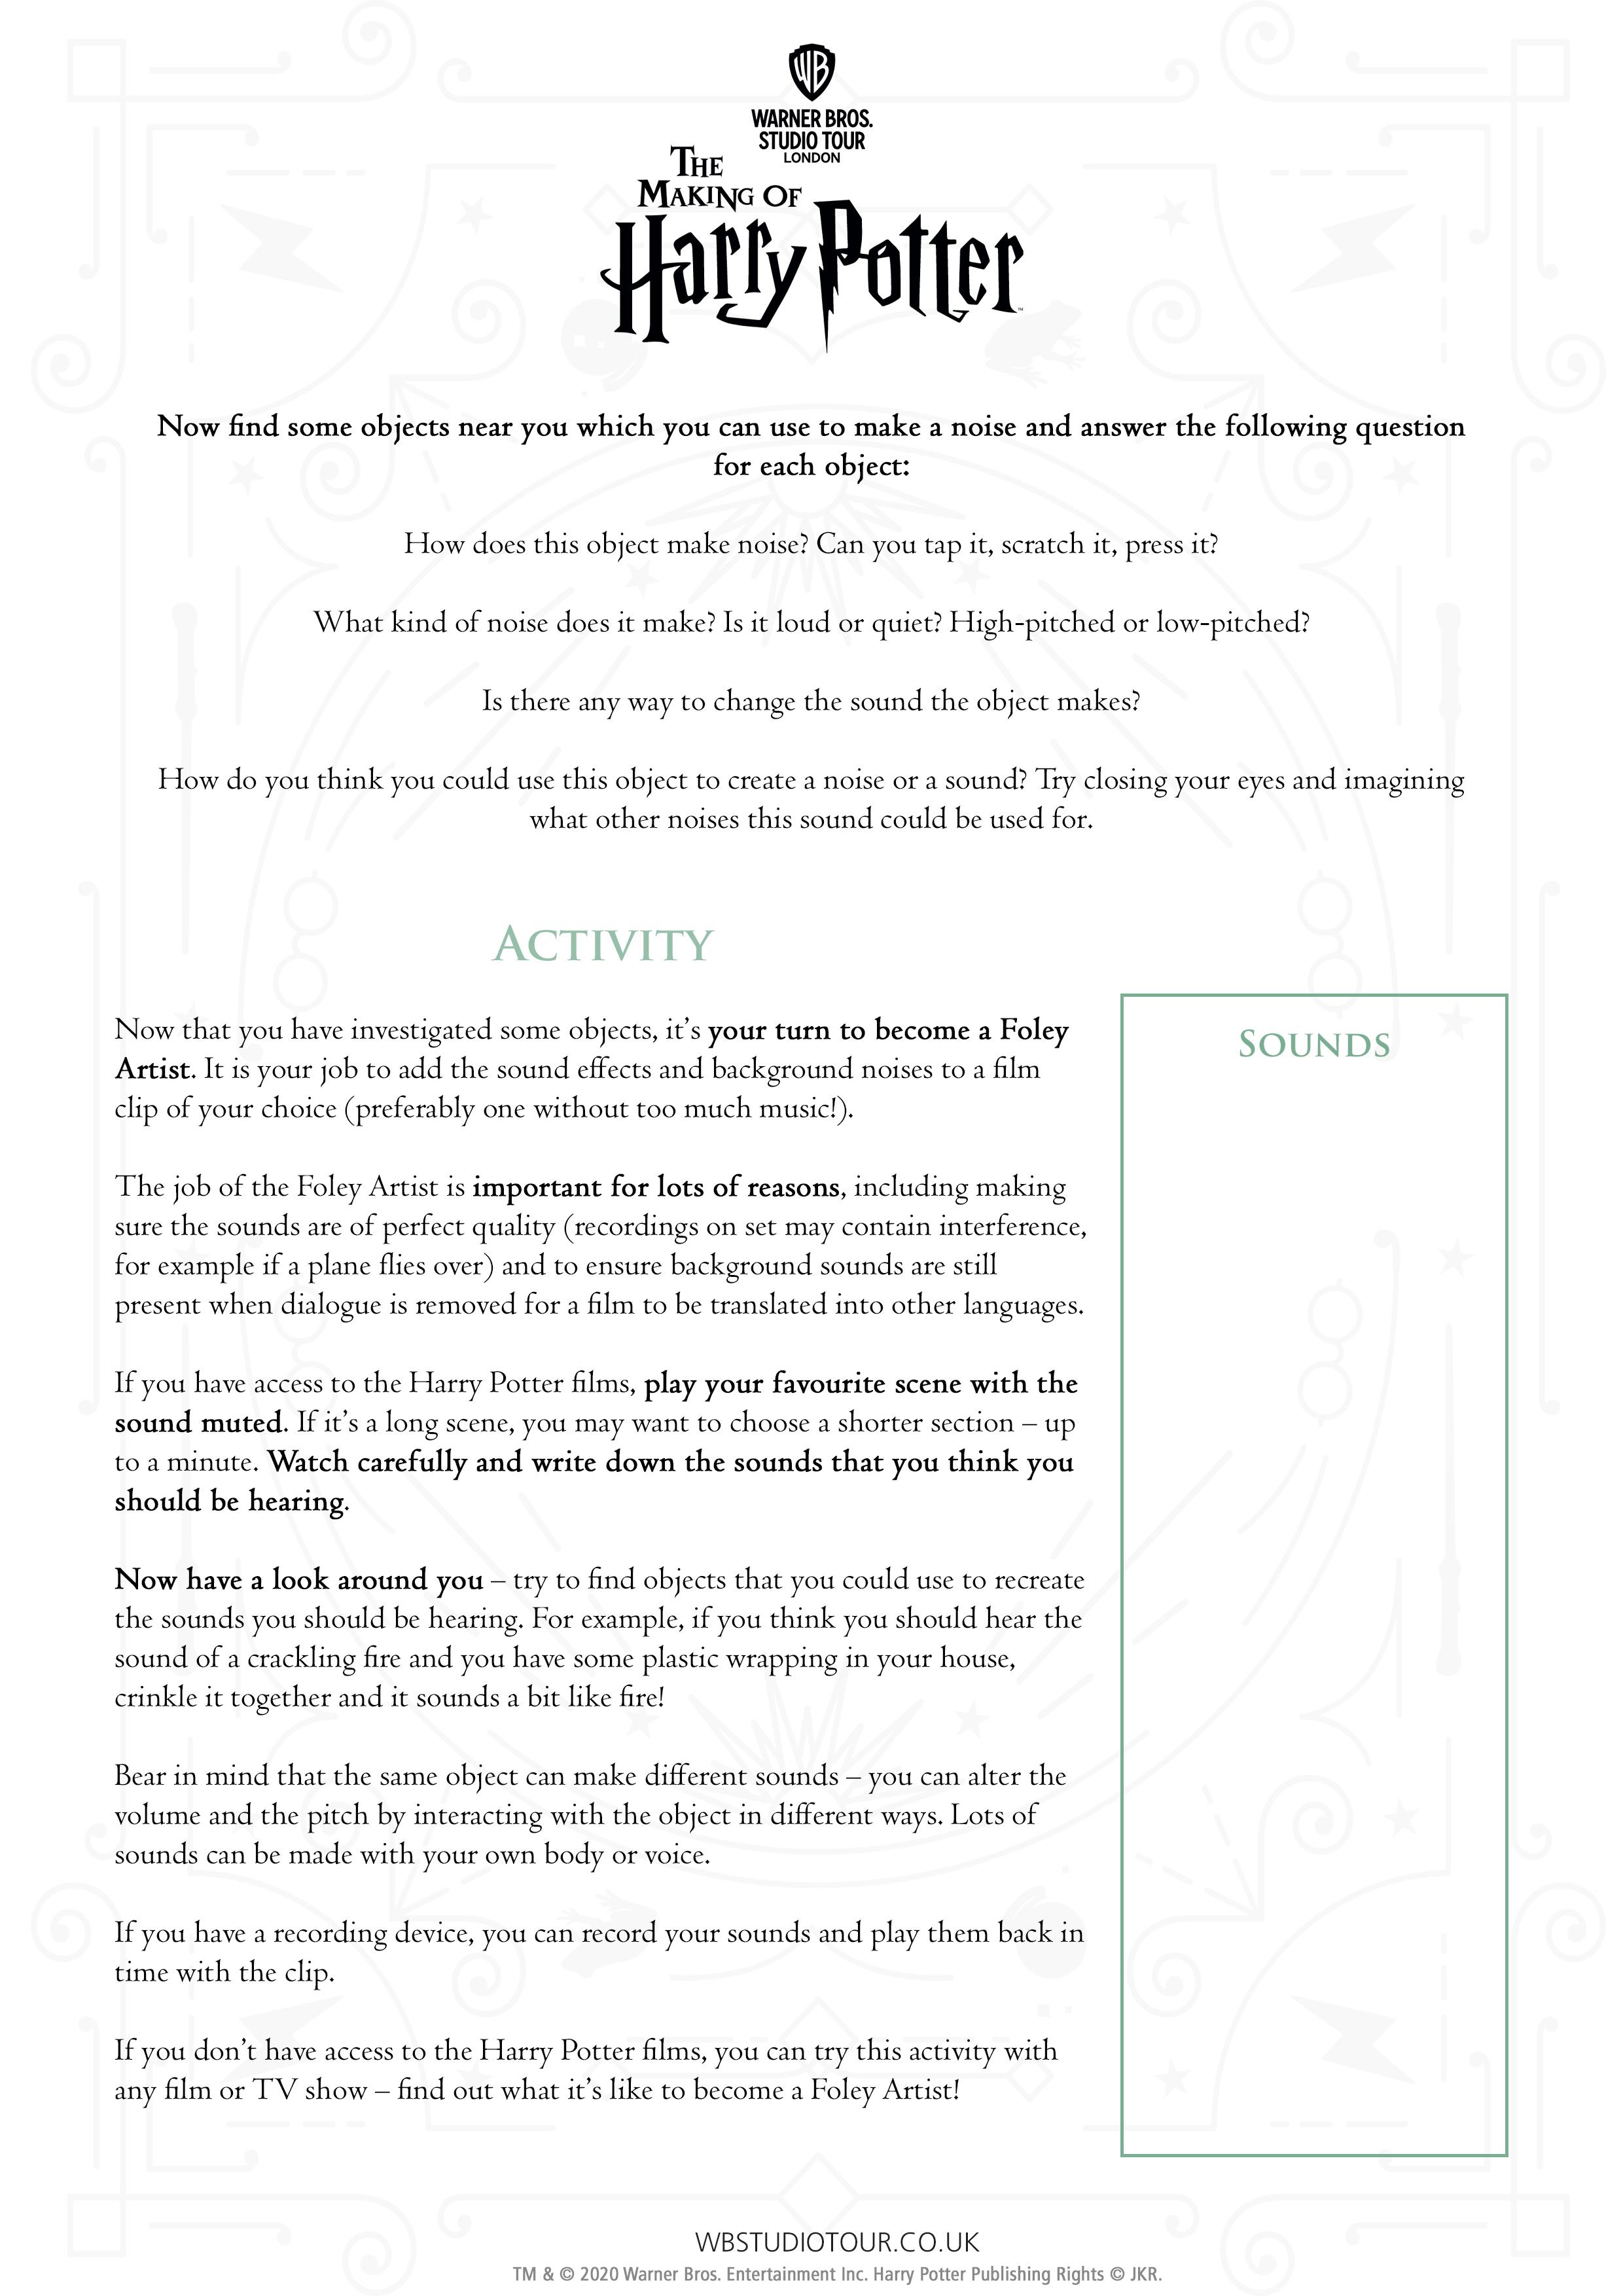 Foley activity sheet page 2